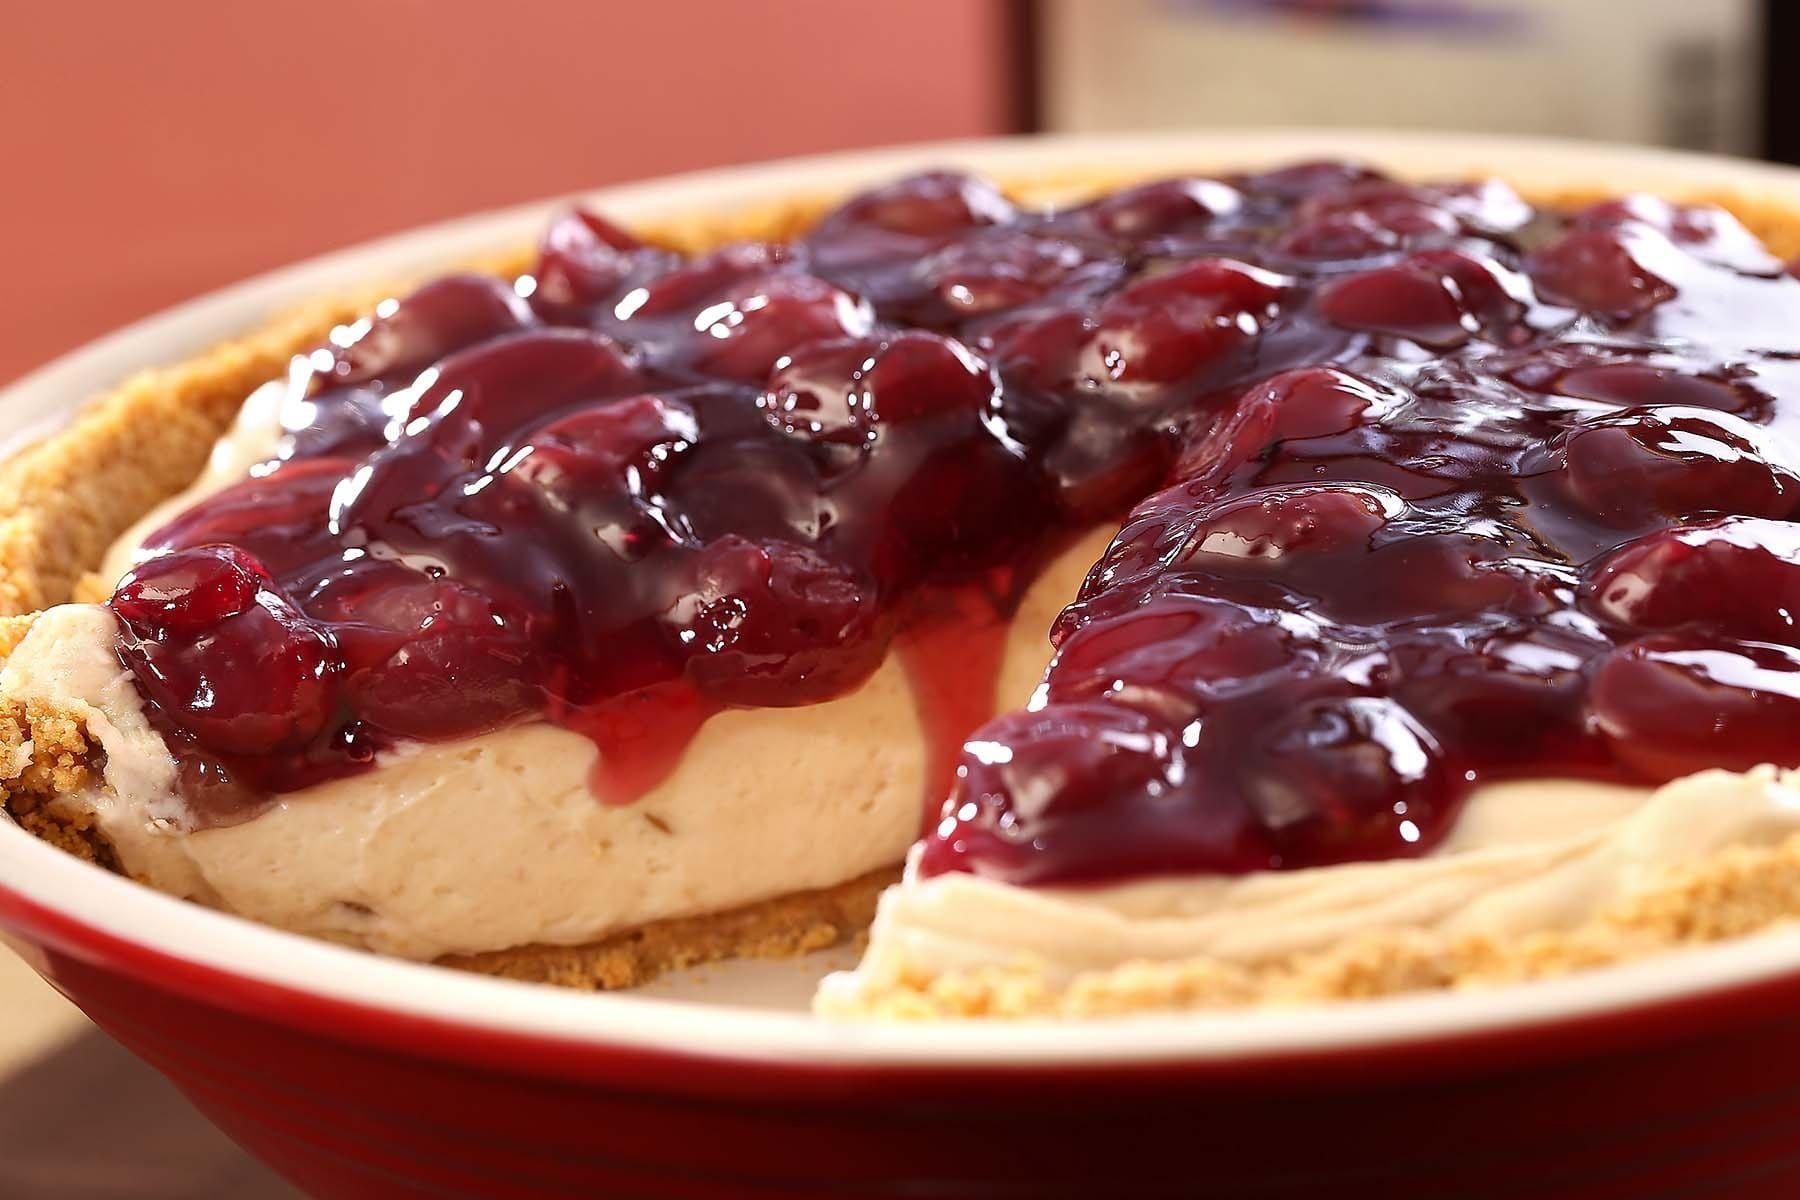 Lou-Manna-Peanut-Butter-Jelly-Pie